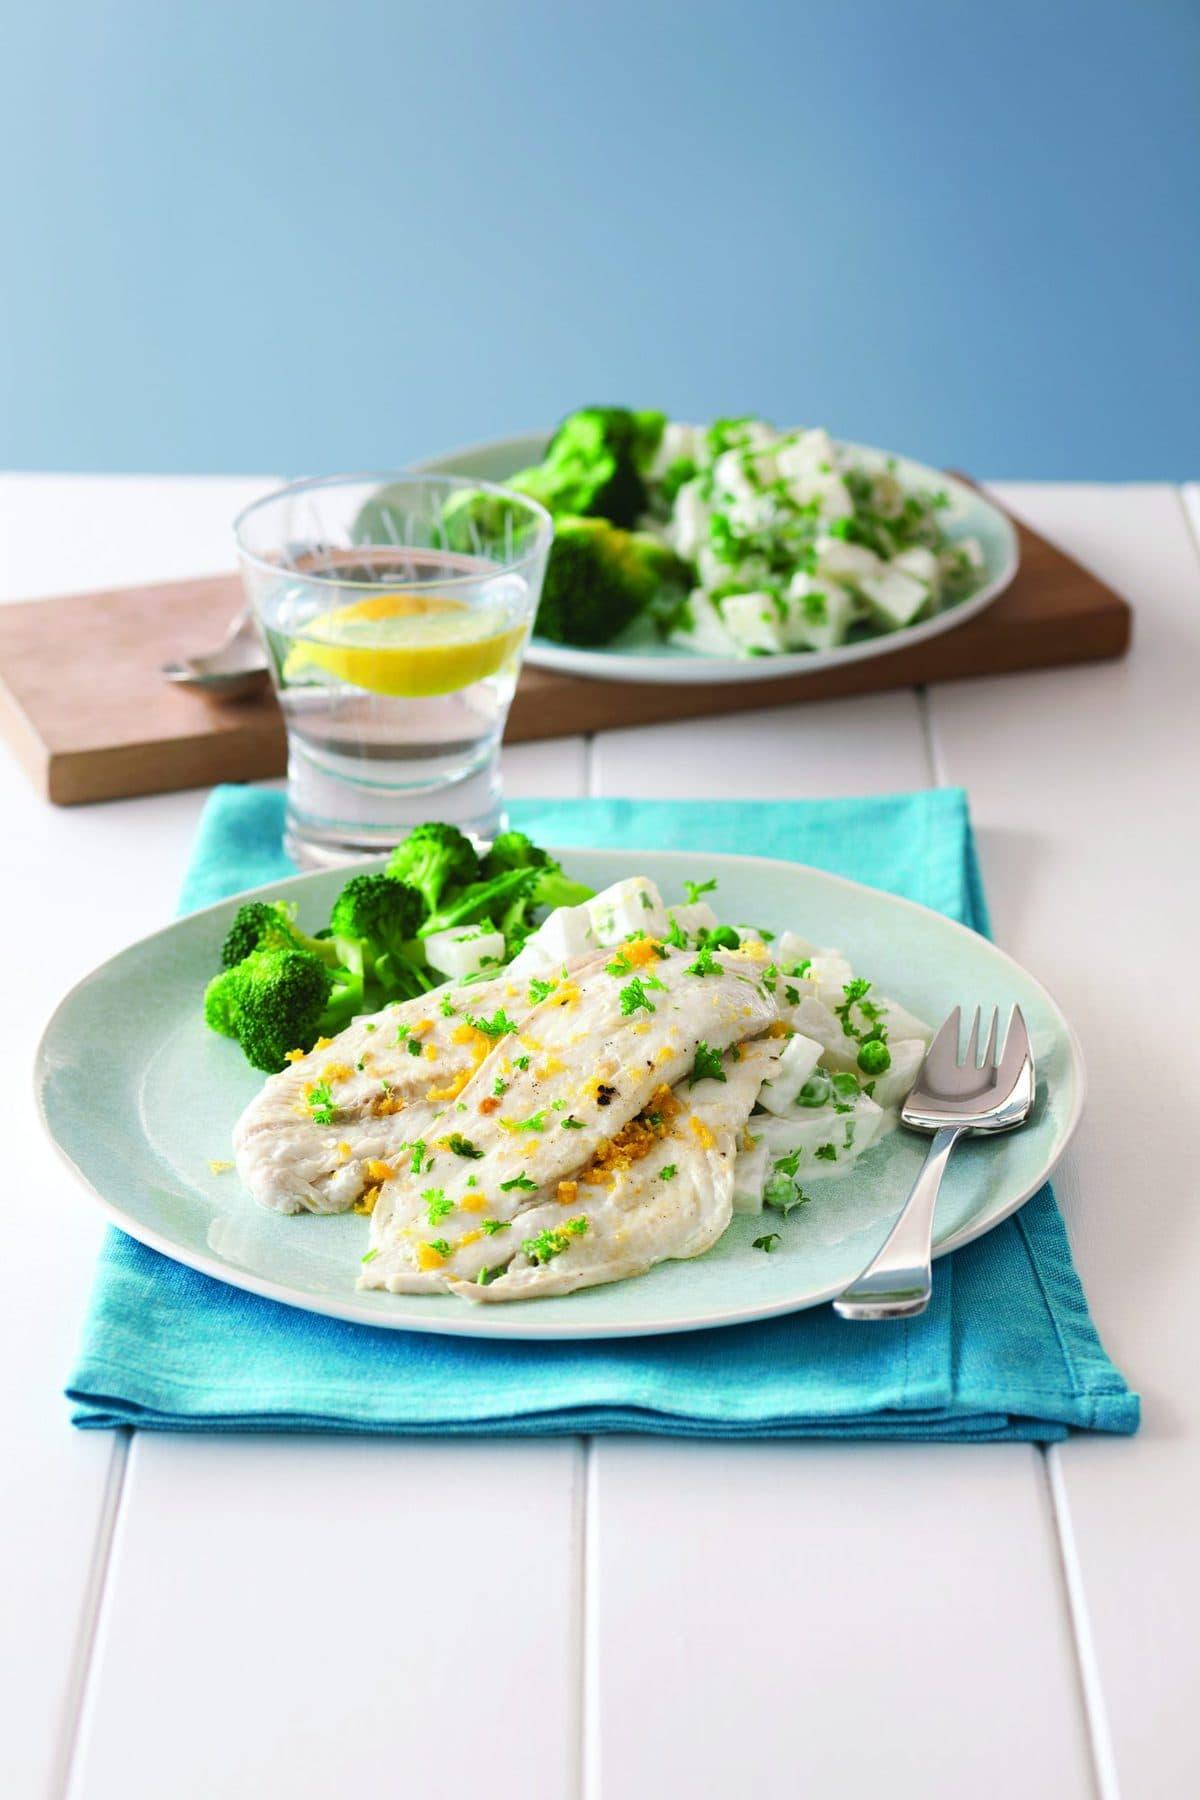 Pan-fried lemon gurnard with parsley potato salad